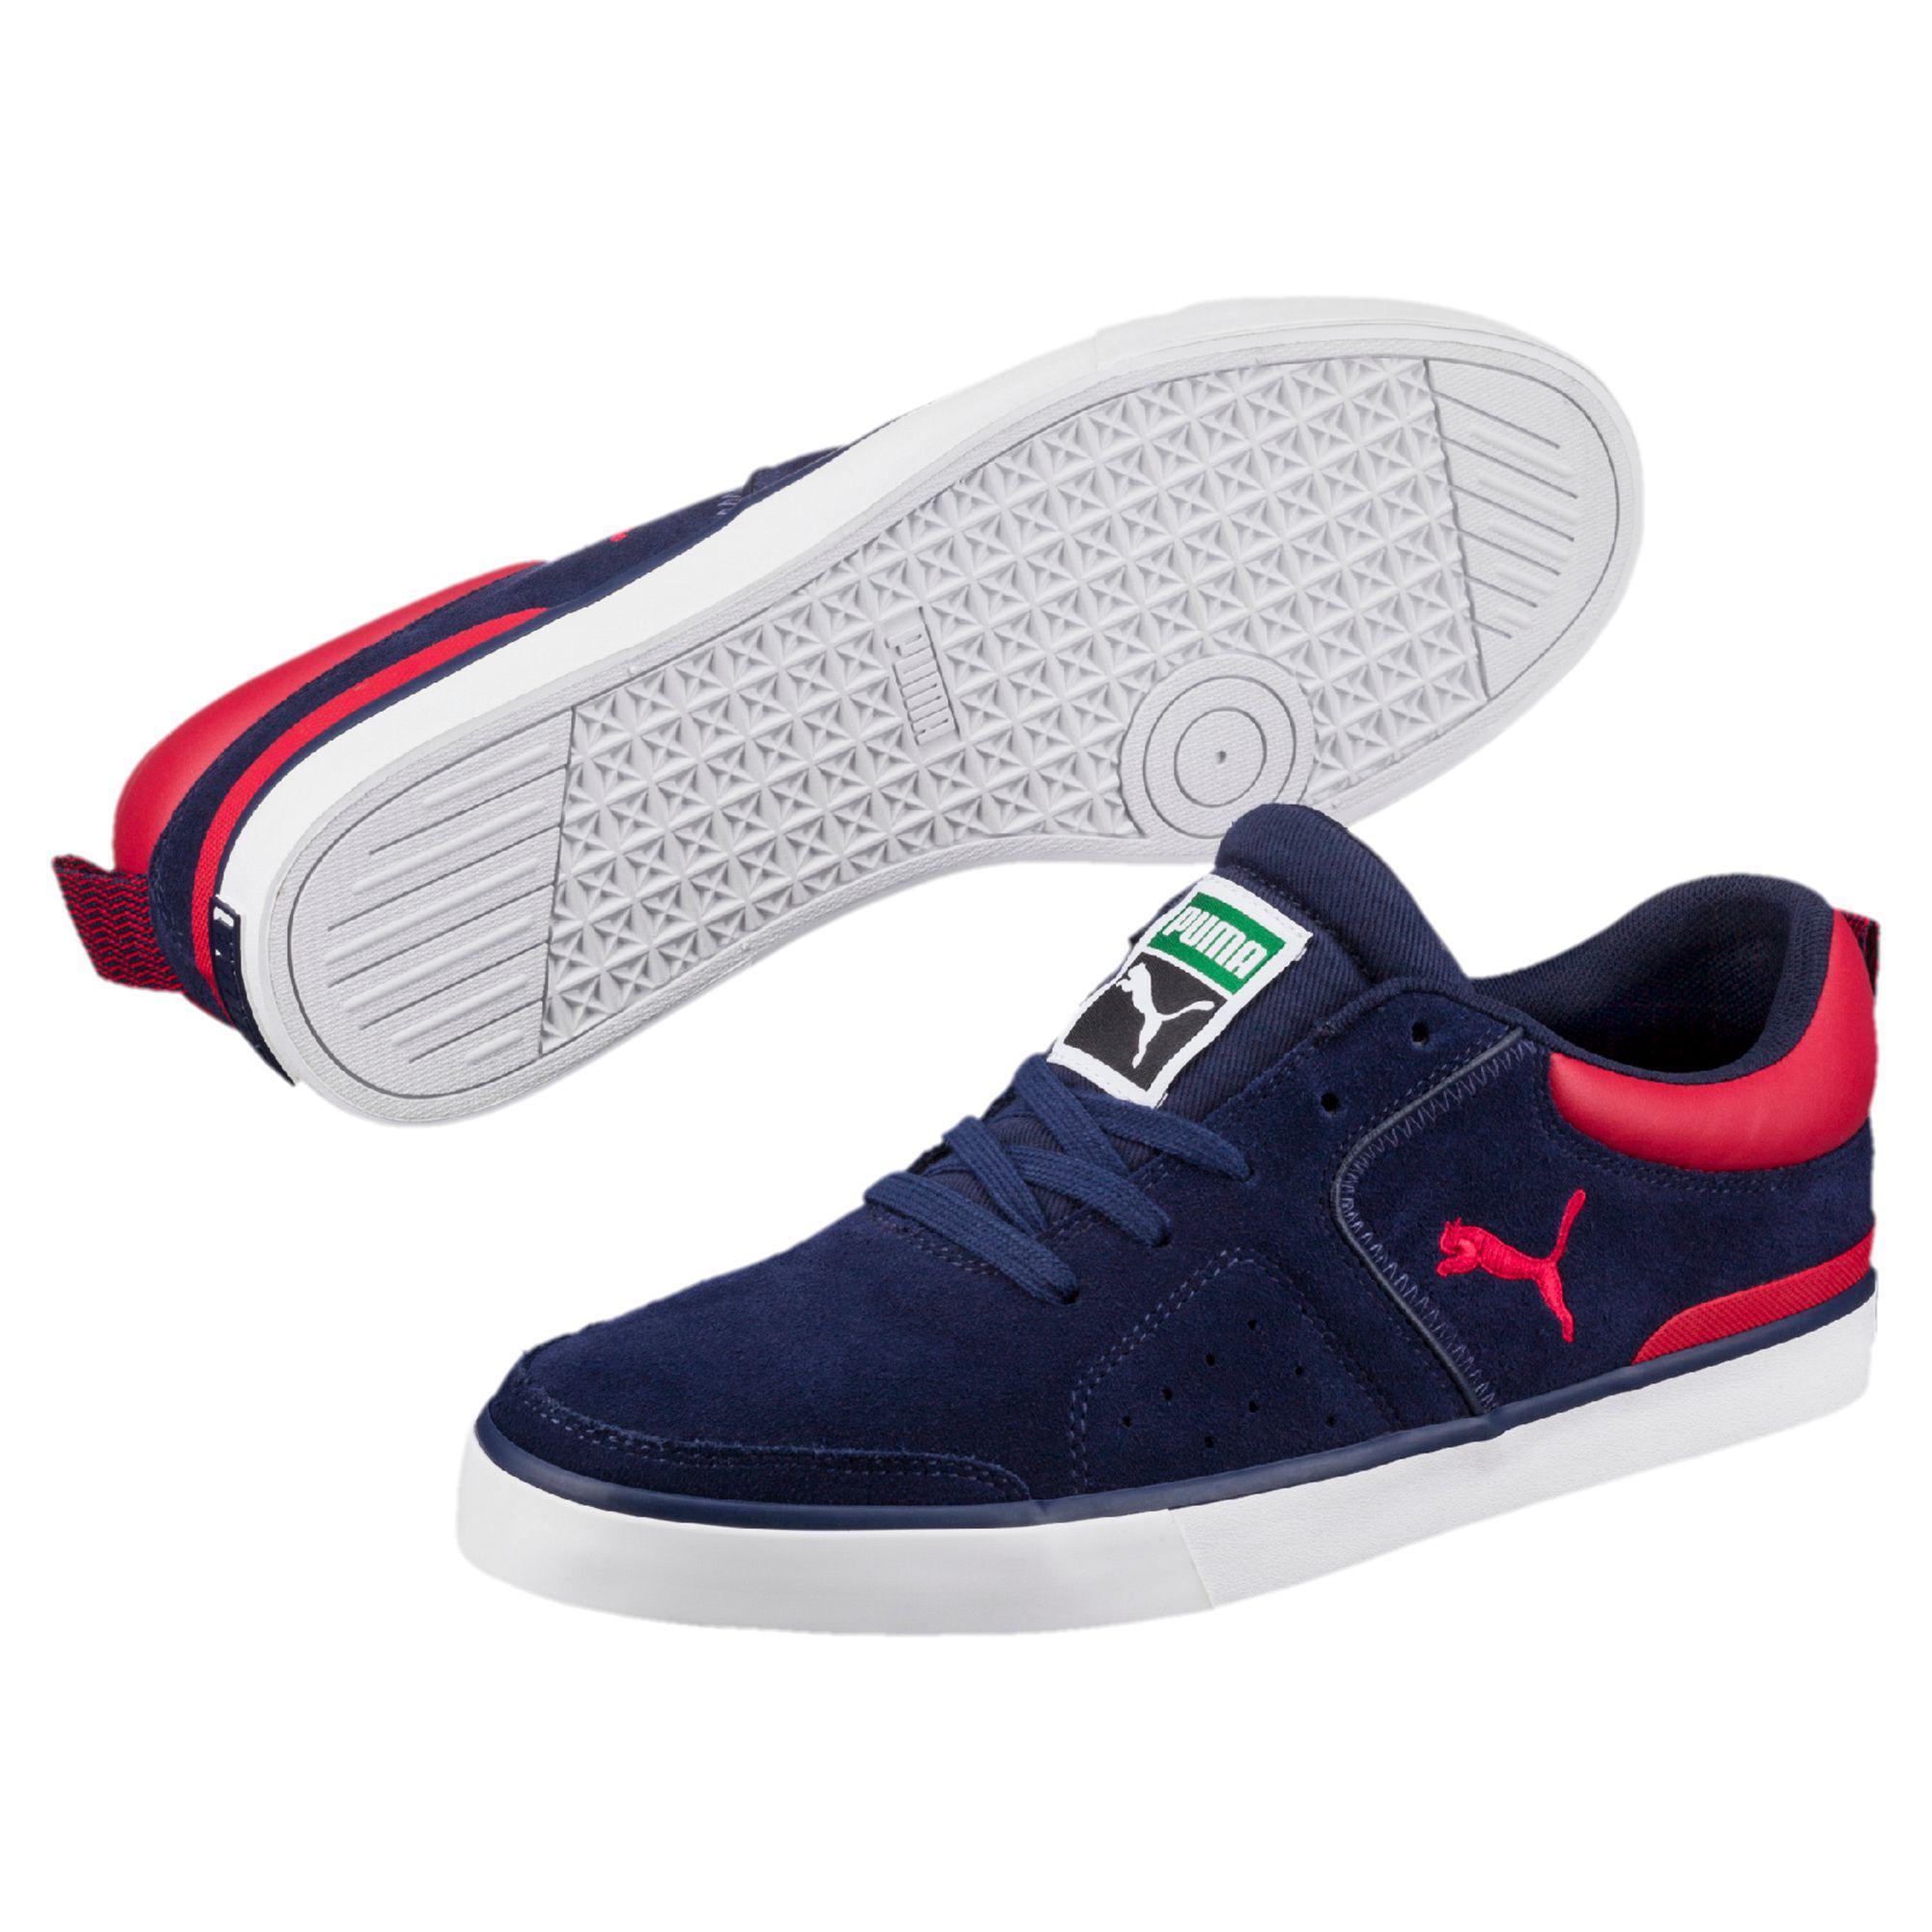 7cf966c64e0813 Lyst - PUMA Funist Slider Vulc Men s Shoes in Blue for Men